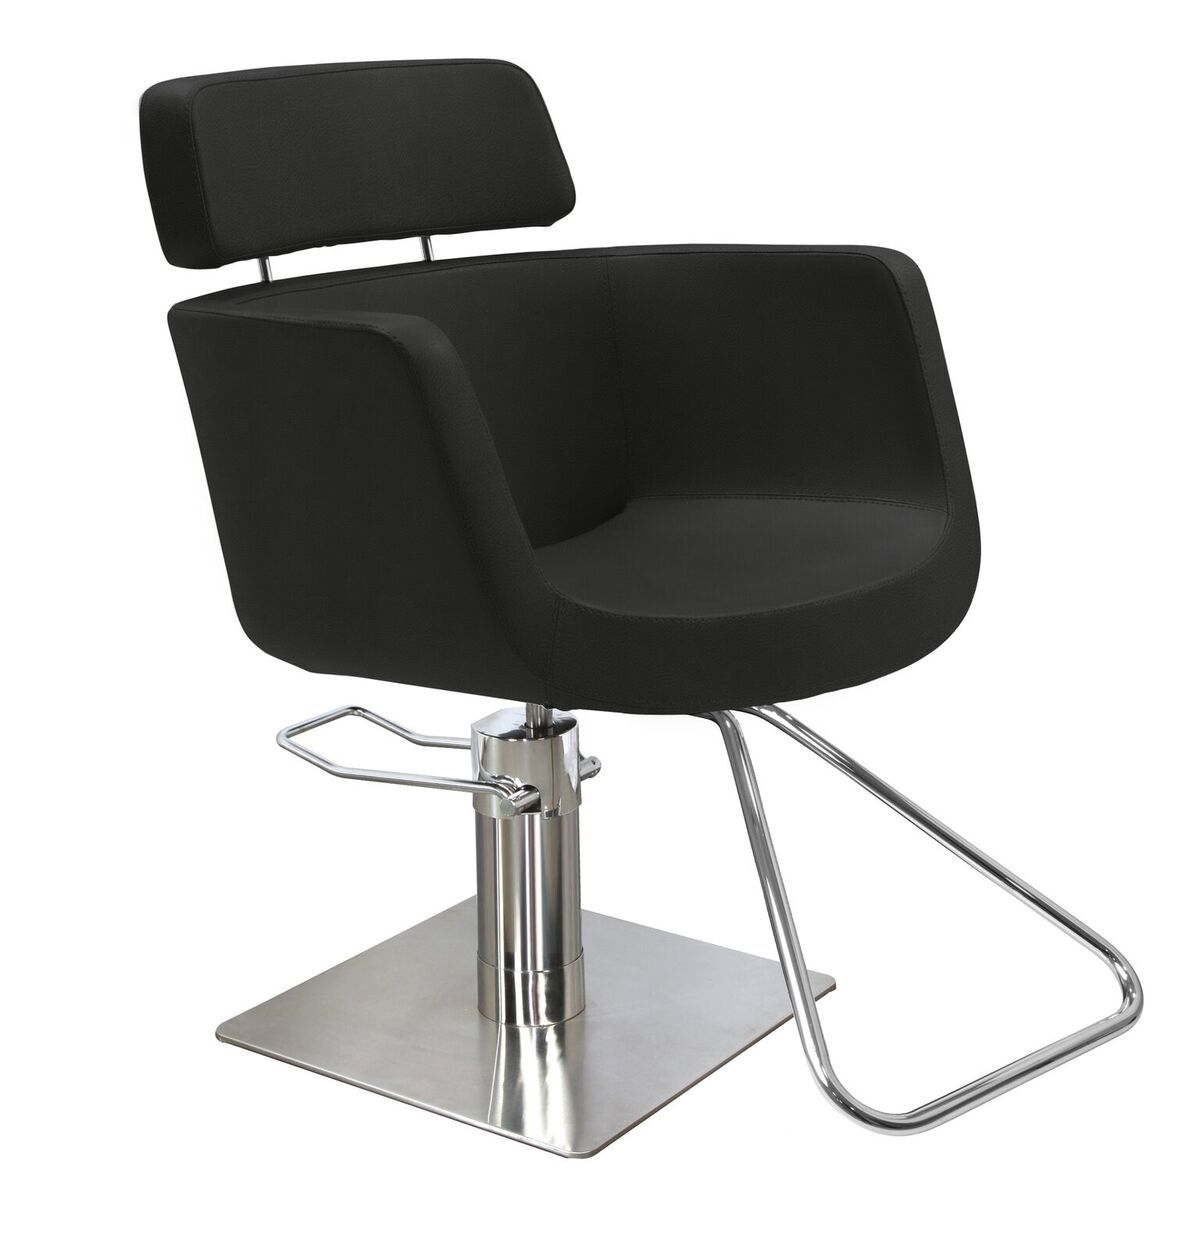 eco fun salon chair in 2019 ultra chic salon inspo salon chairs rh pinterest com cheap modern salon chairs modern hairdressing chairs